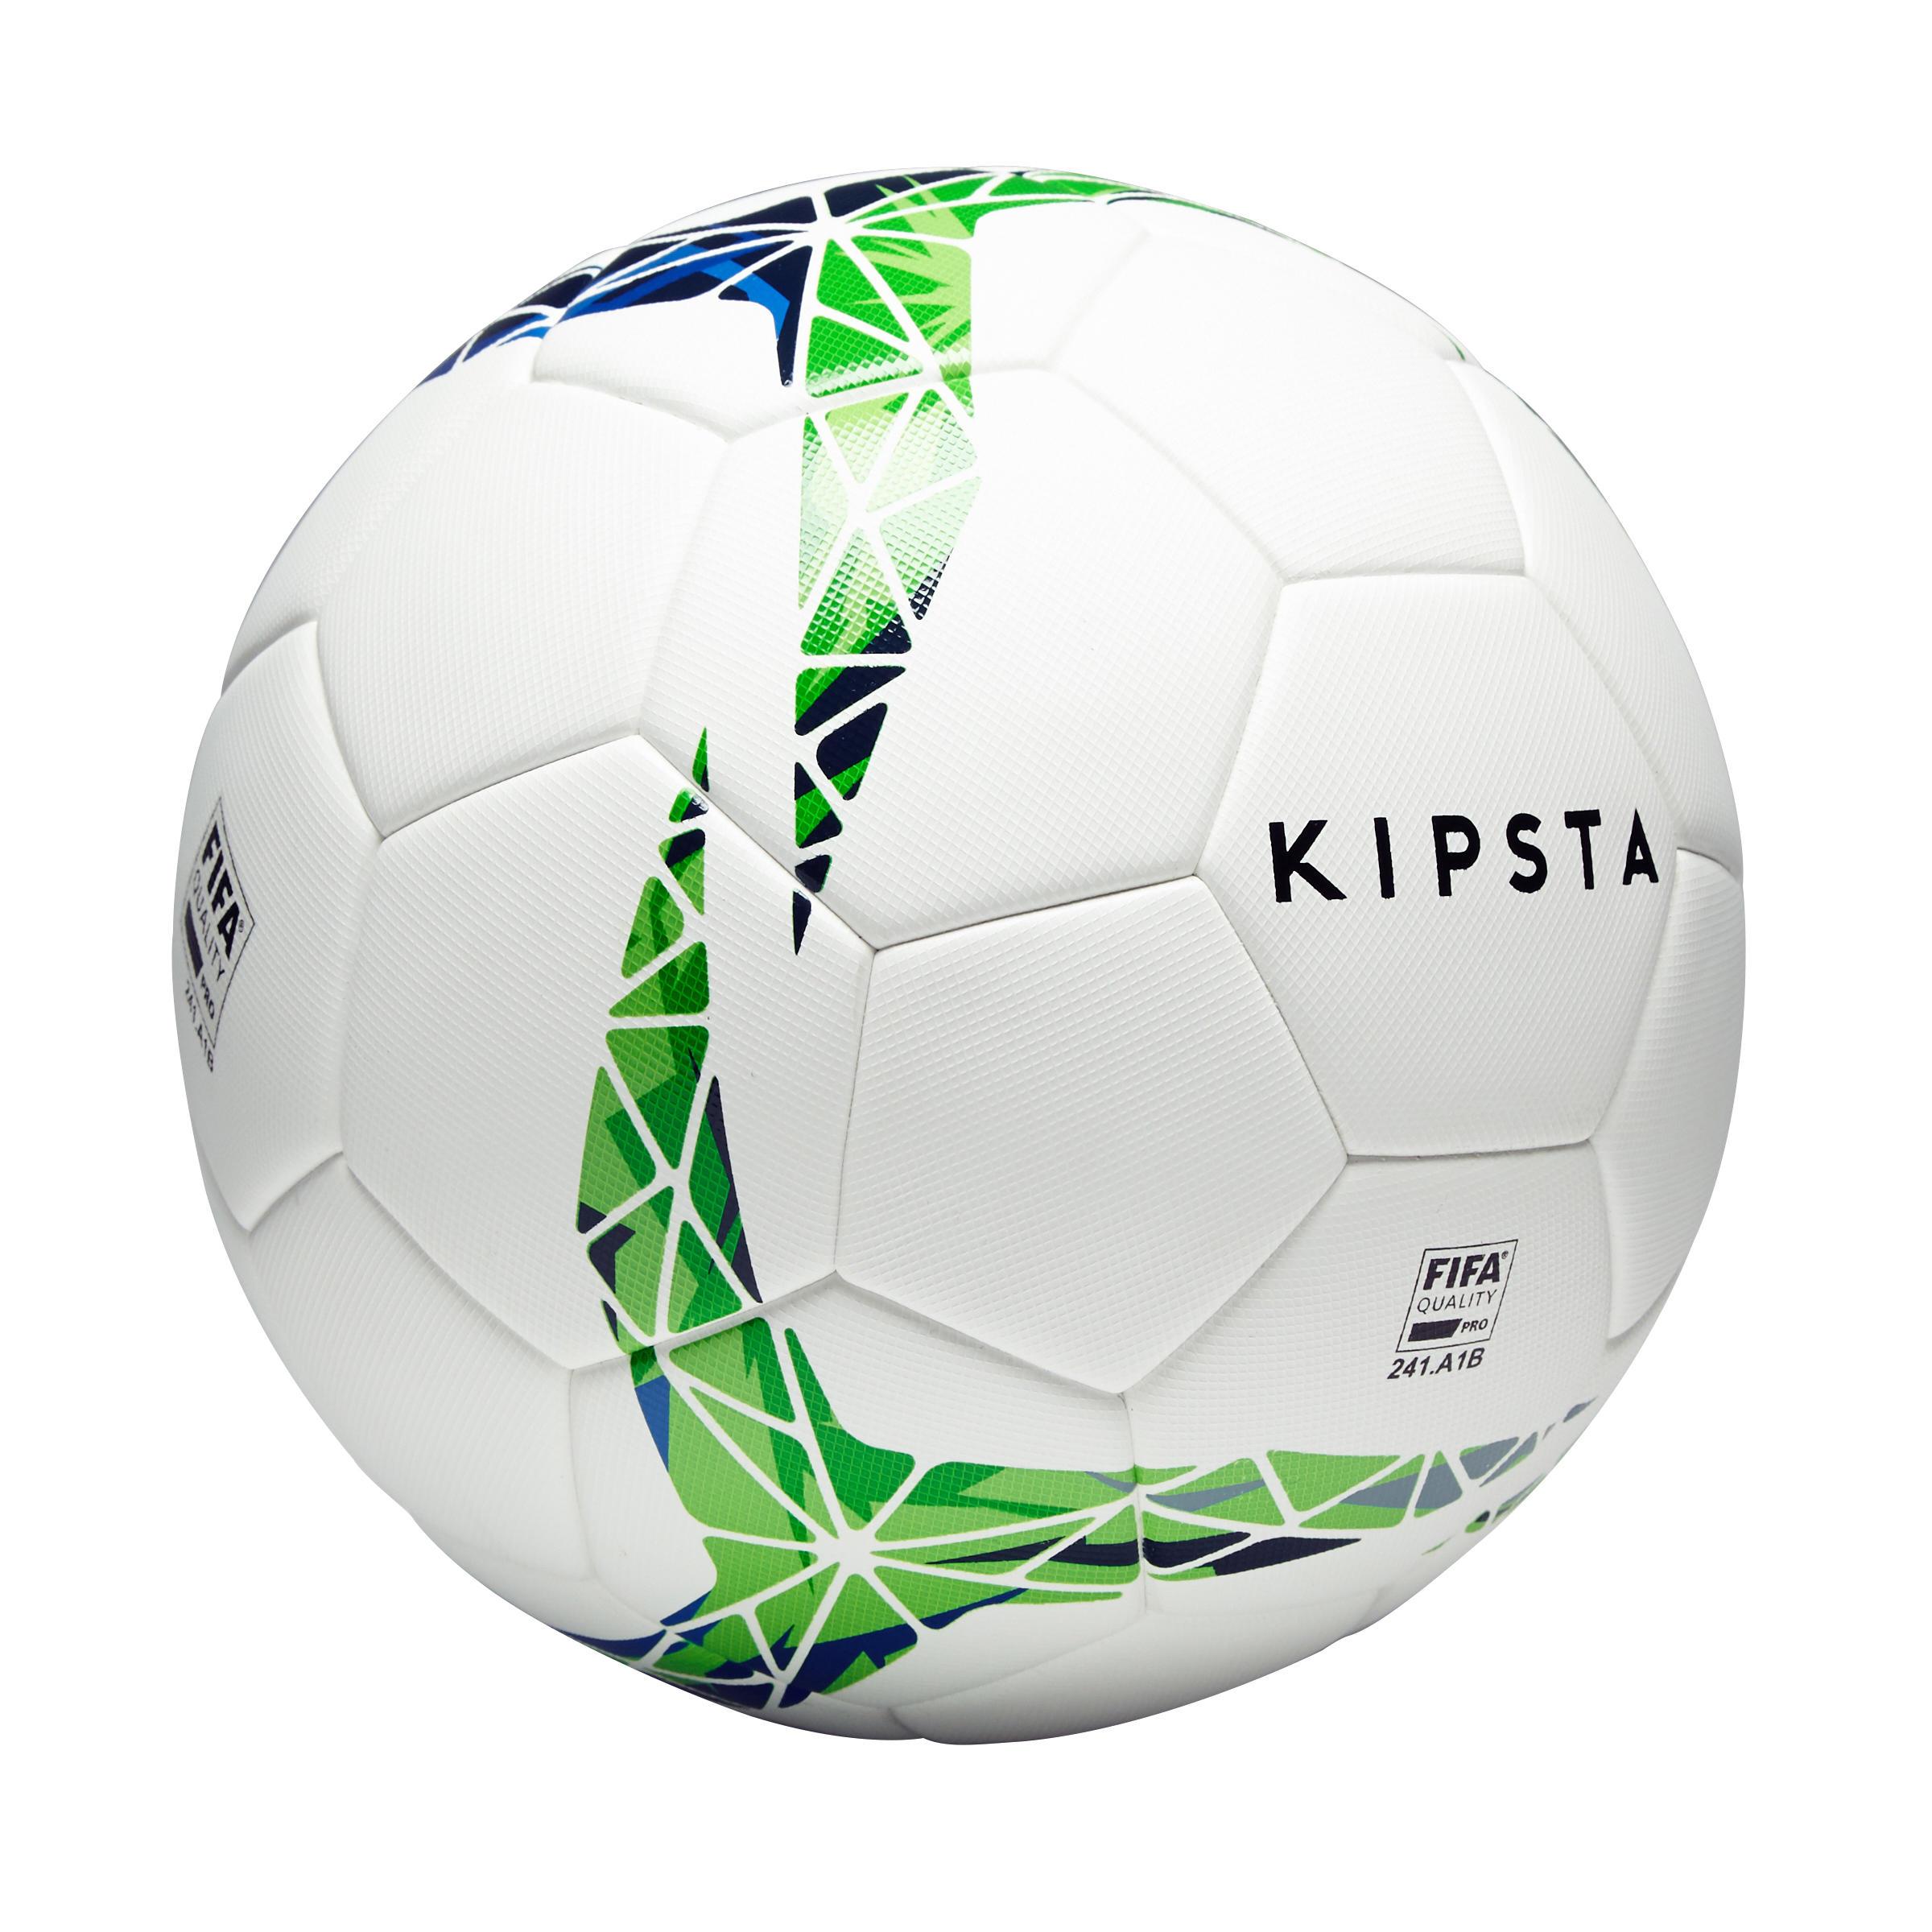 b7f5b9f87423d Balón de Fútbol Kipsta F900 FIFA PRO termosellado talla 5 blanco azul rojo